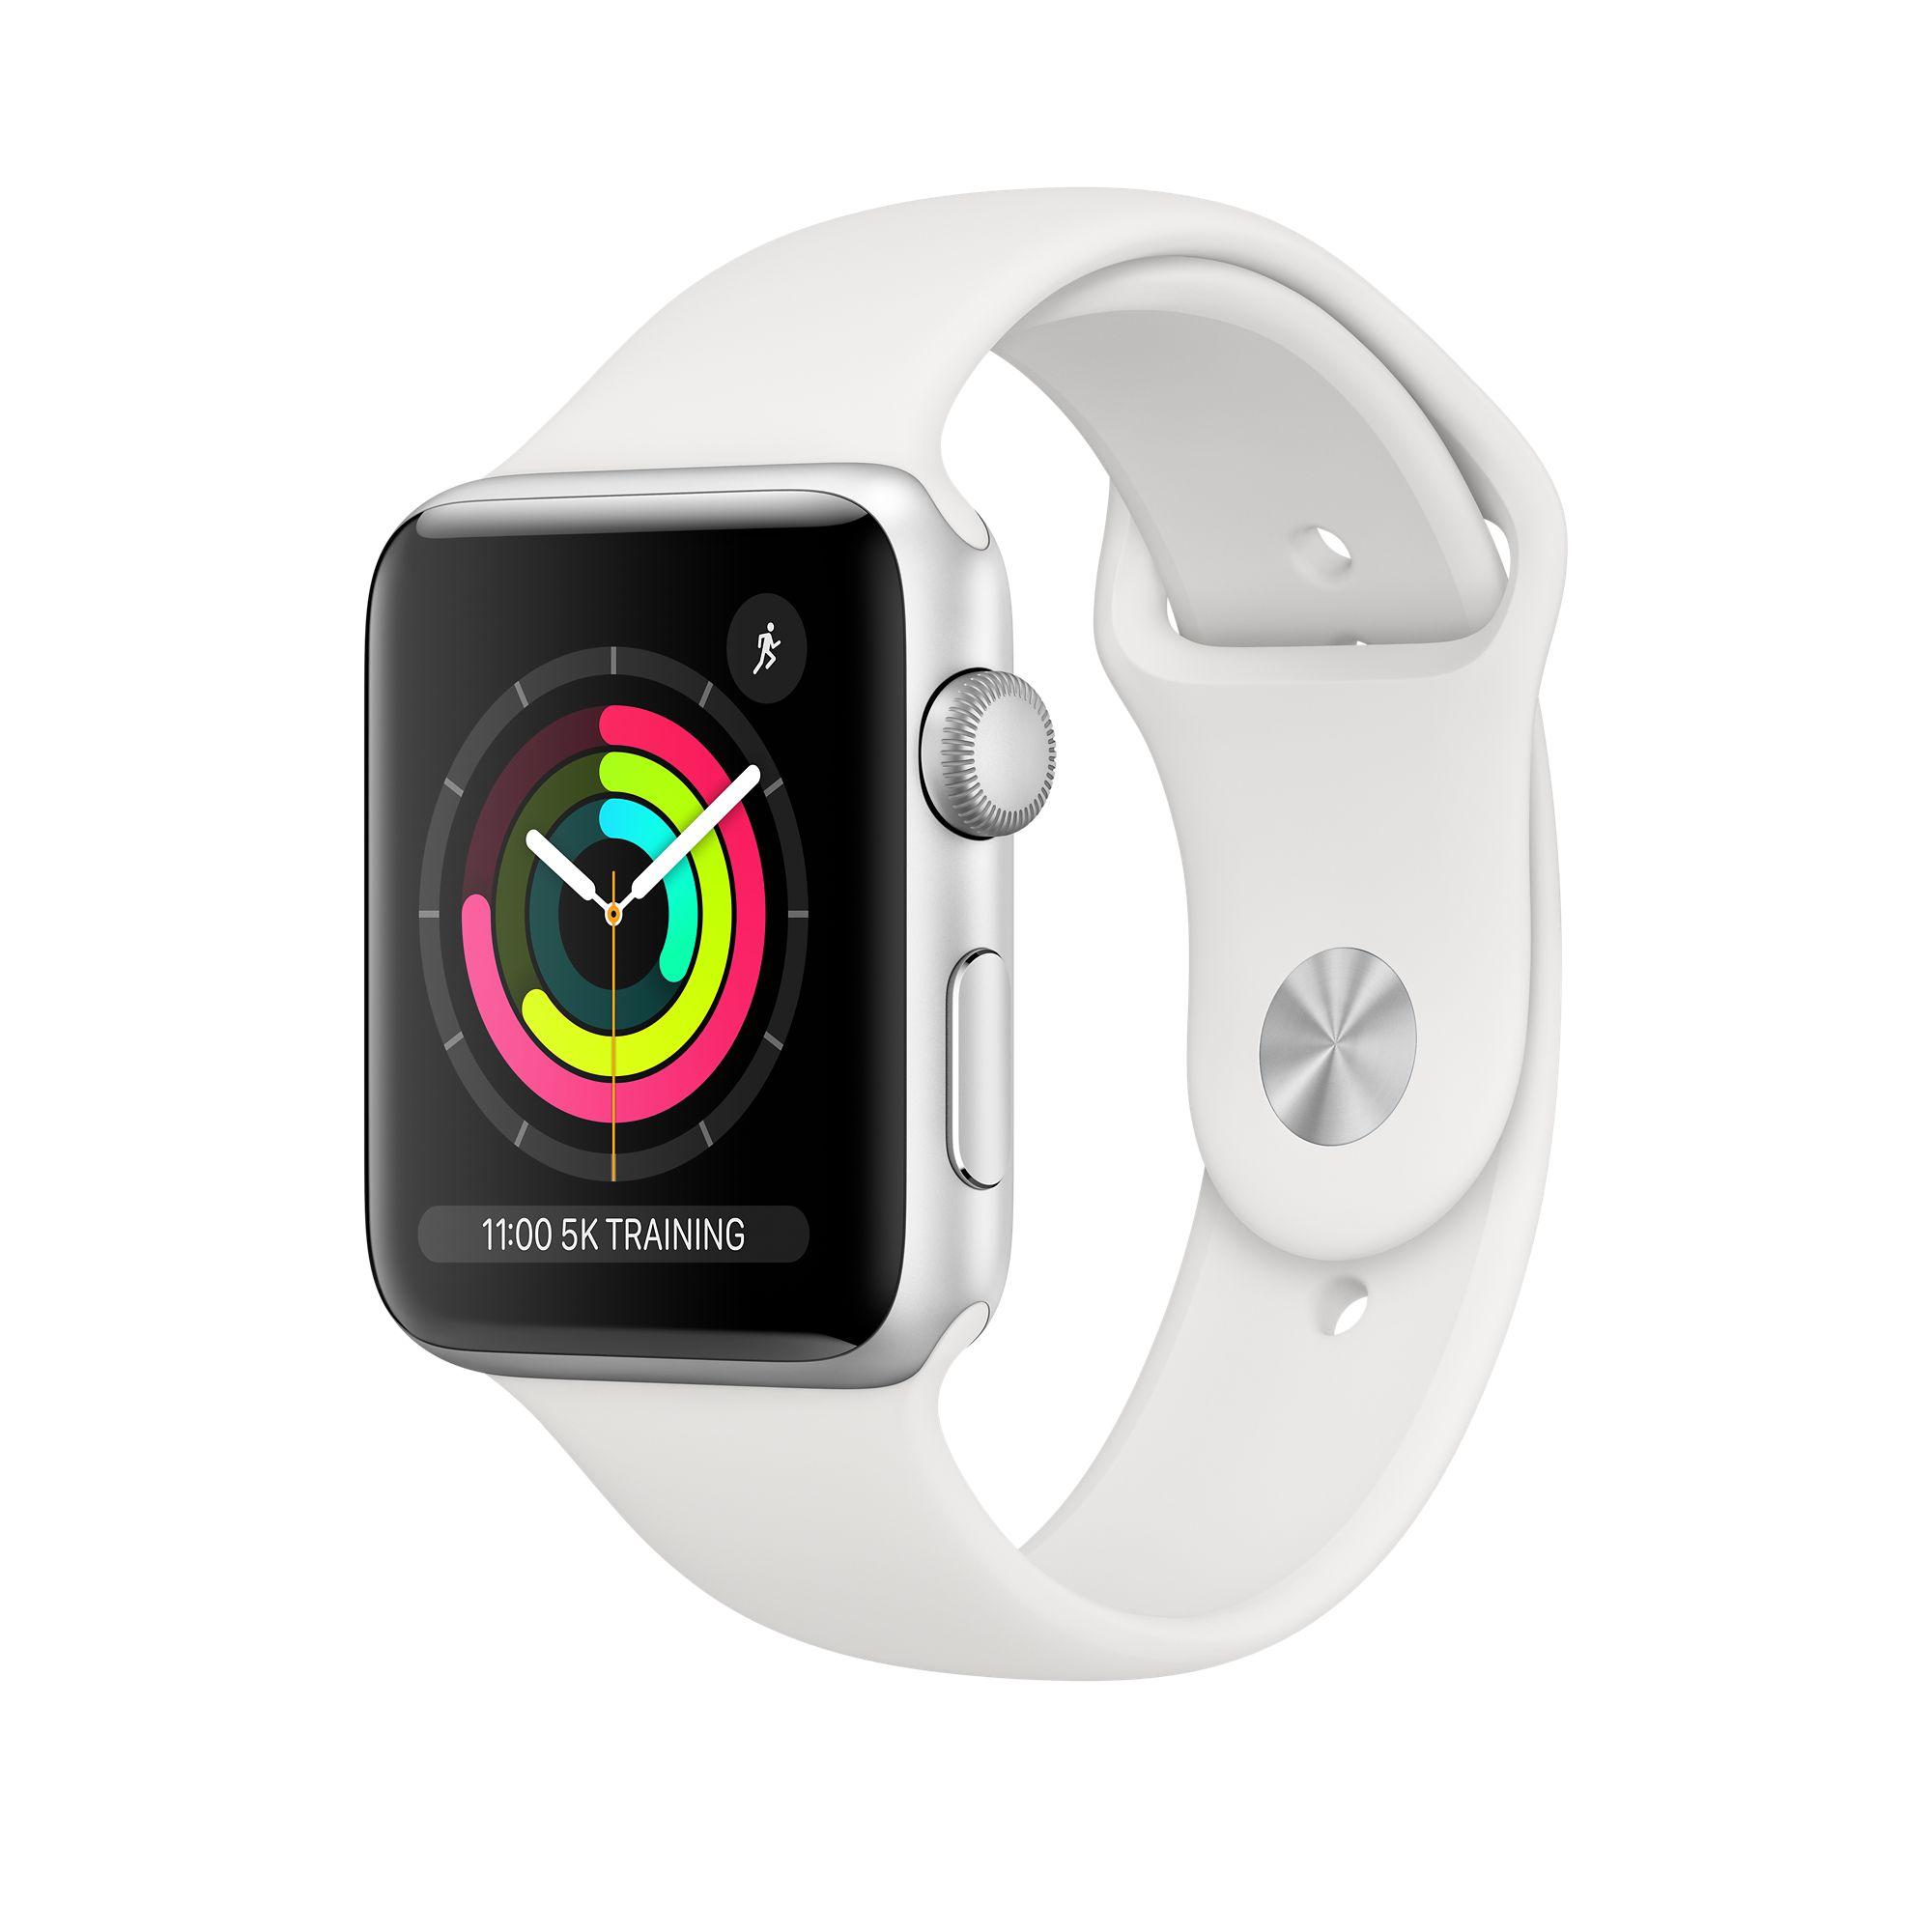 Apple Watch Series 3 (Aluminum, GPS, 42